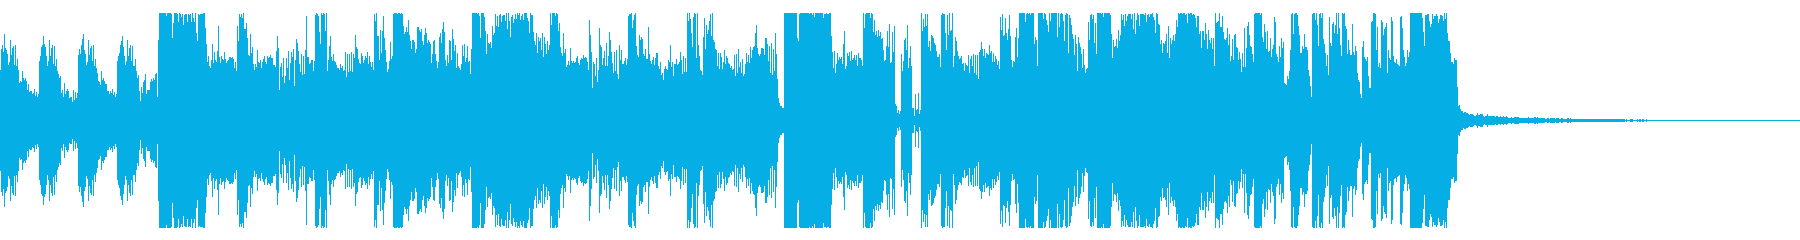 YouTube ダブステップジングル05の再生済みの波形